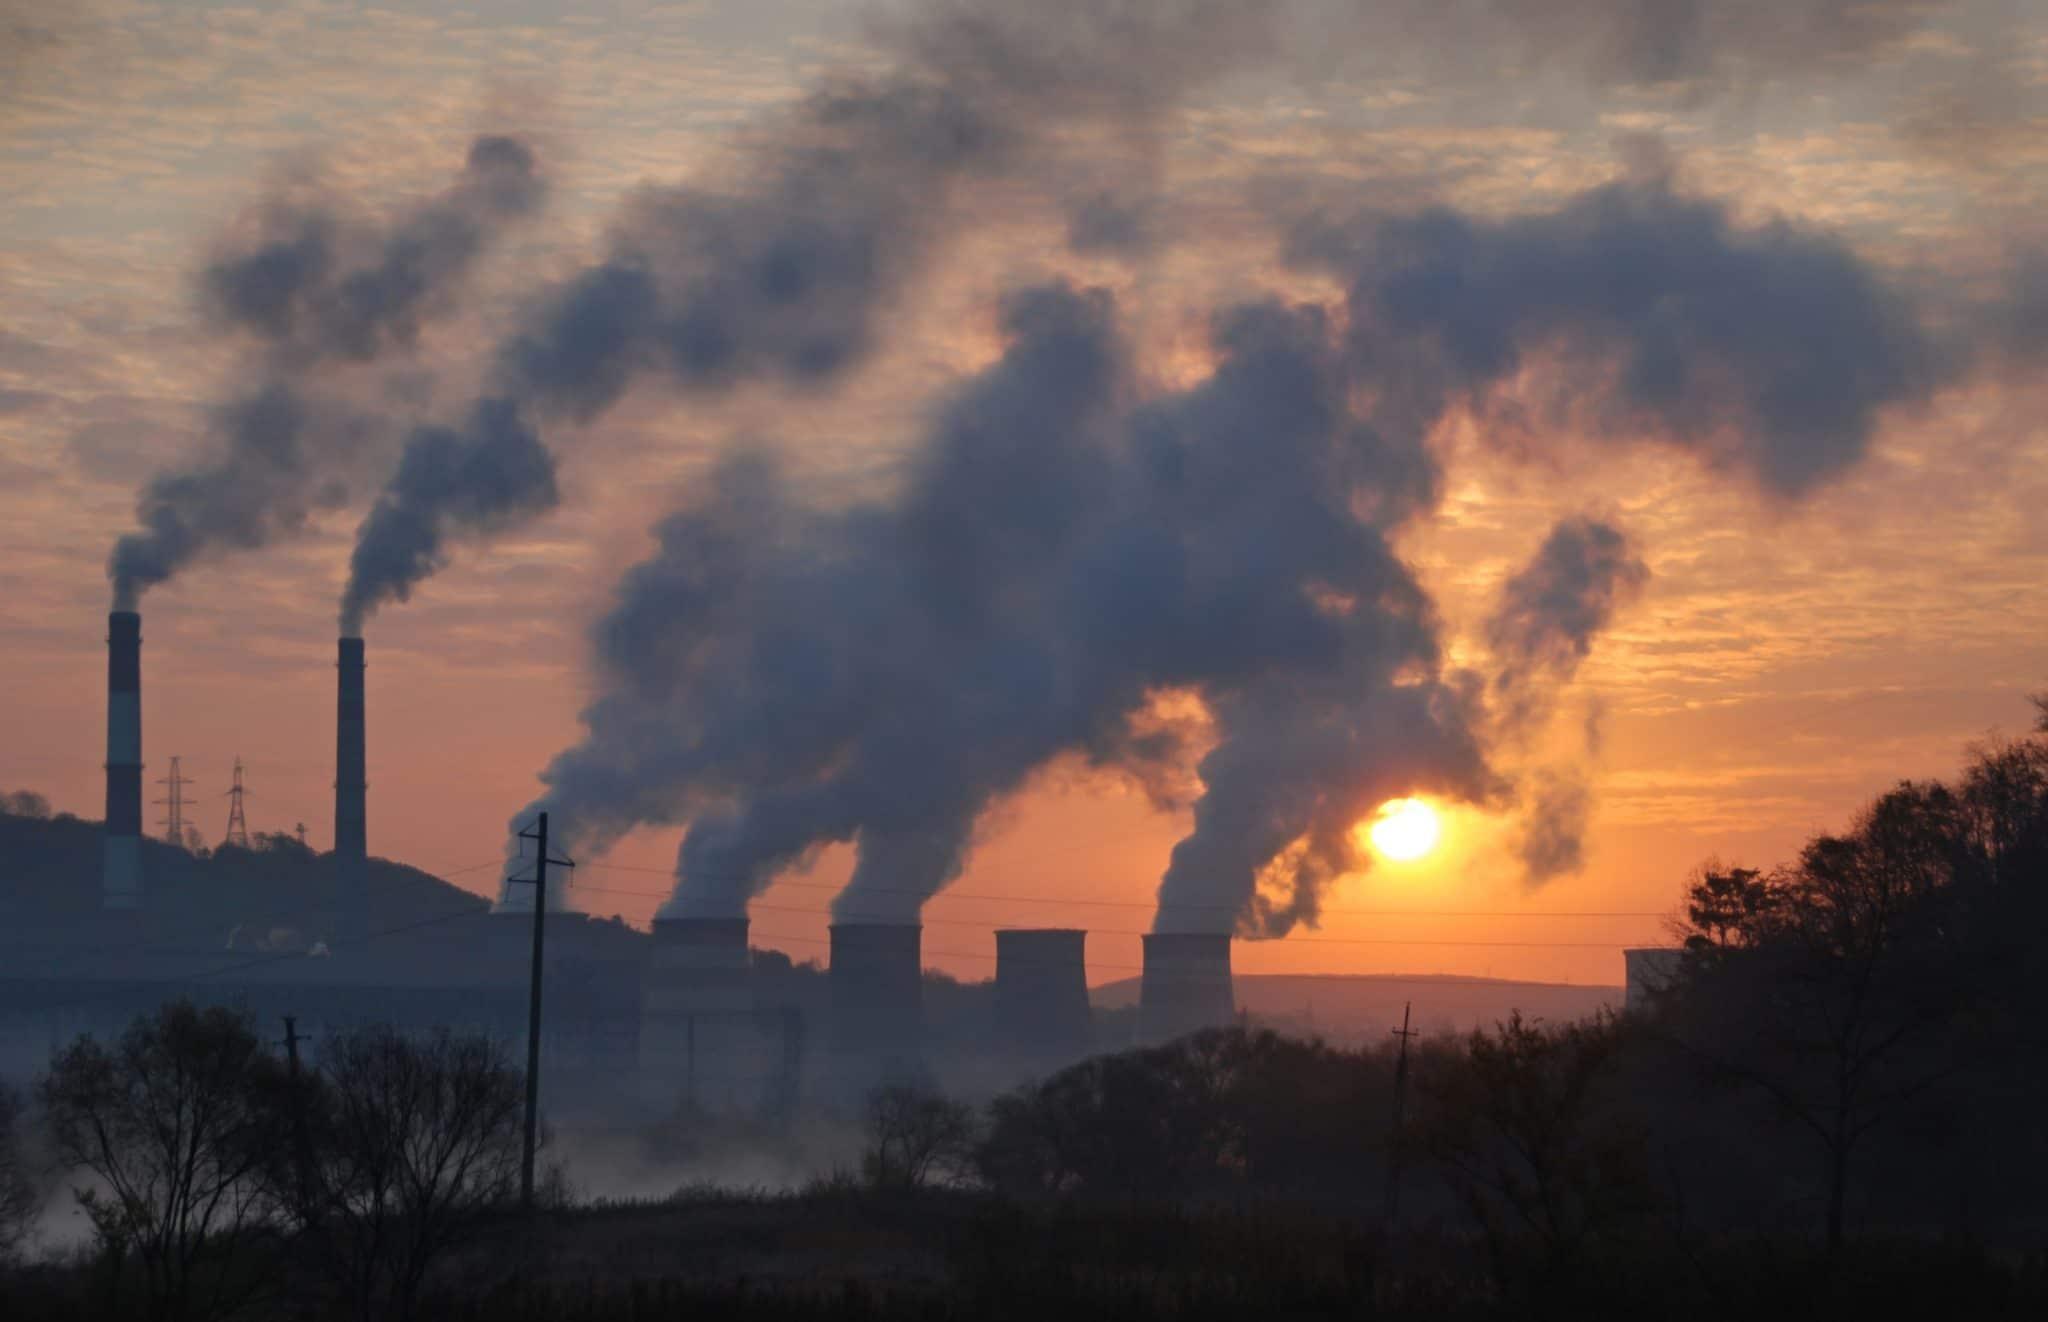 -kozid-Frankreich-will-Umweltverschmutzung-streng-bestrafen